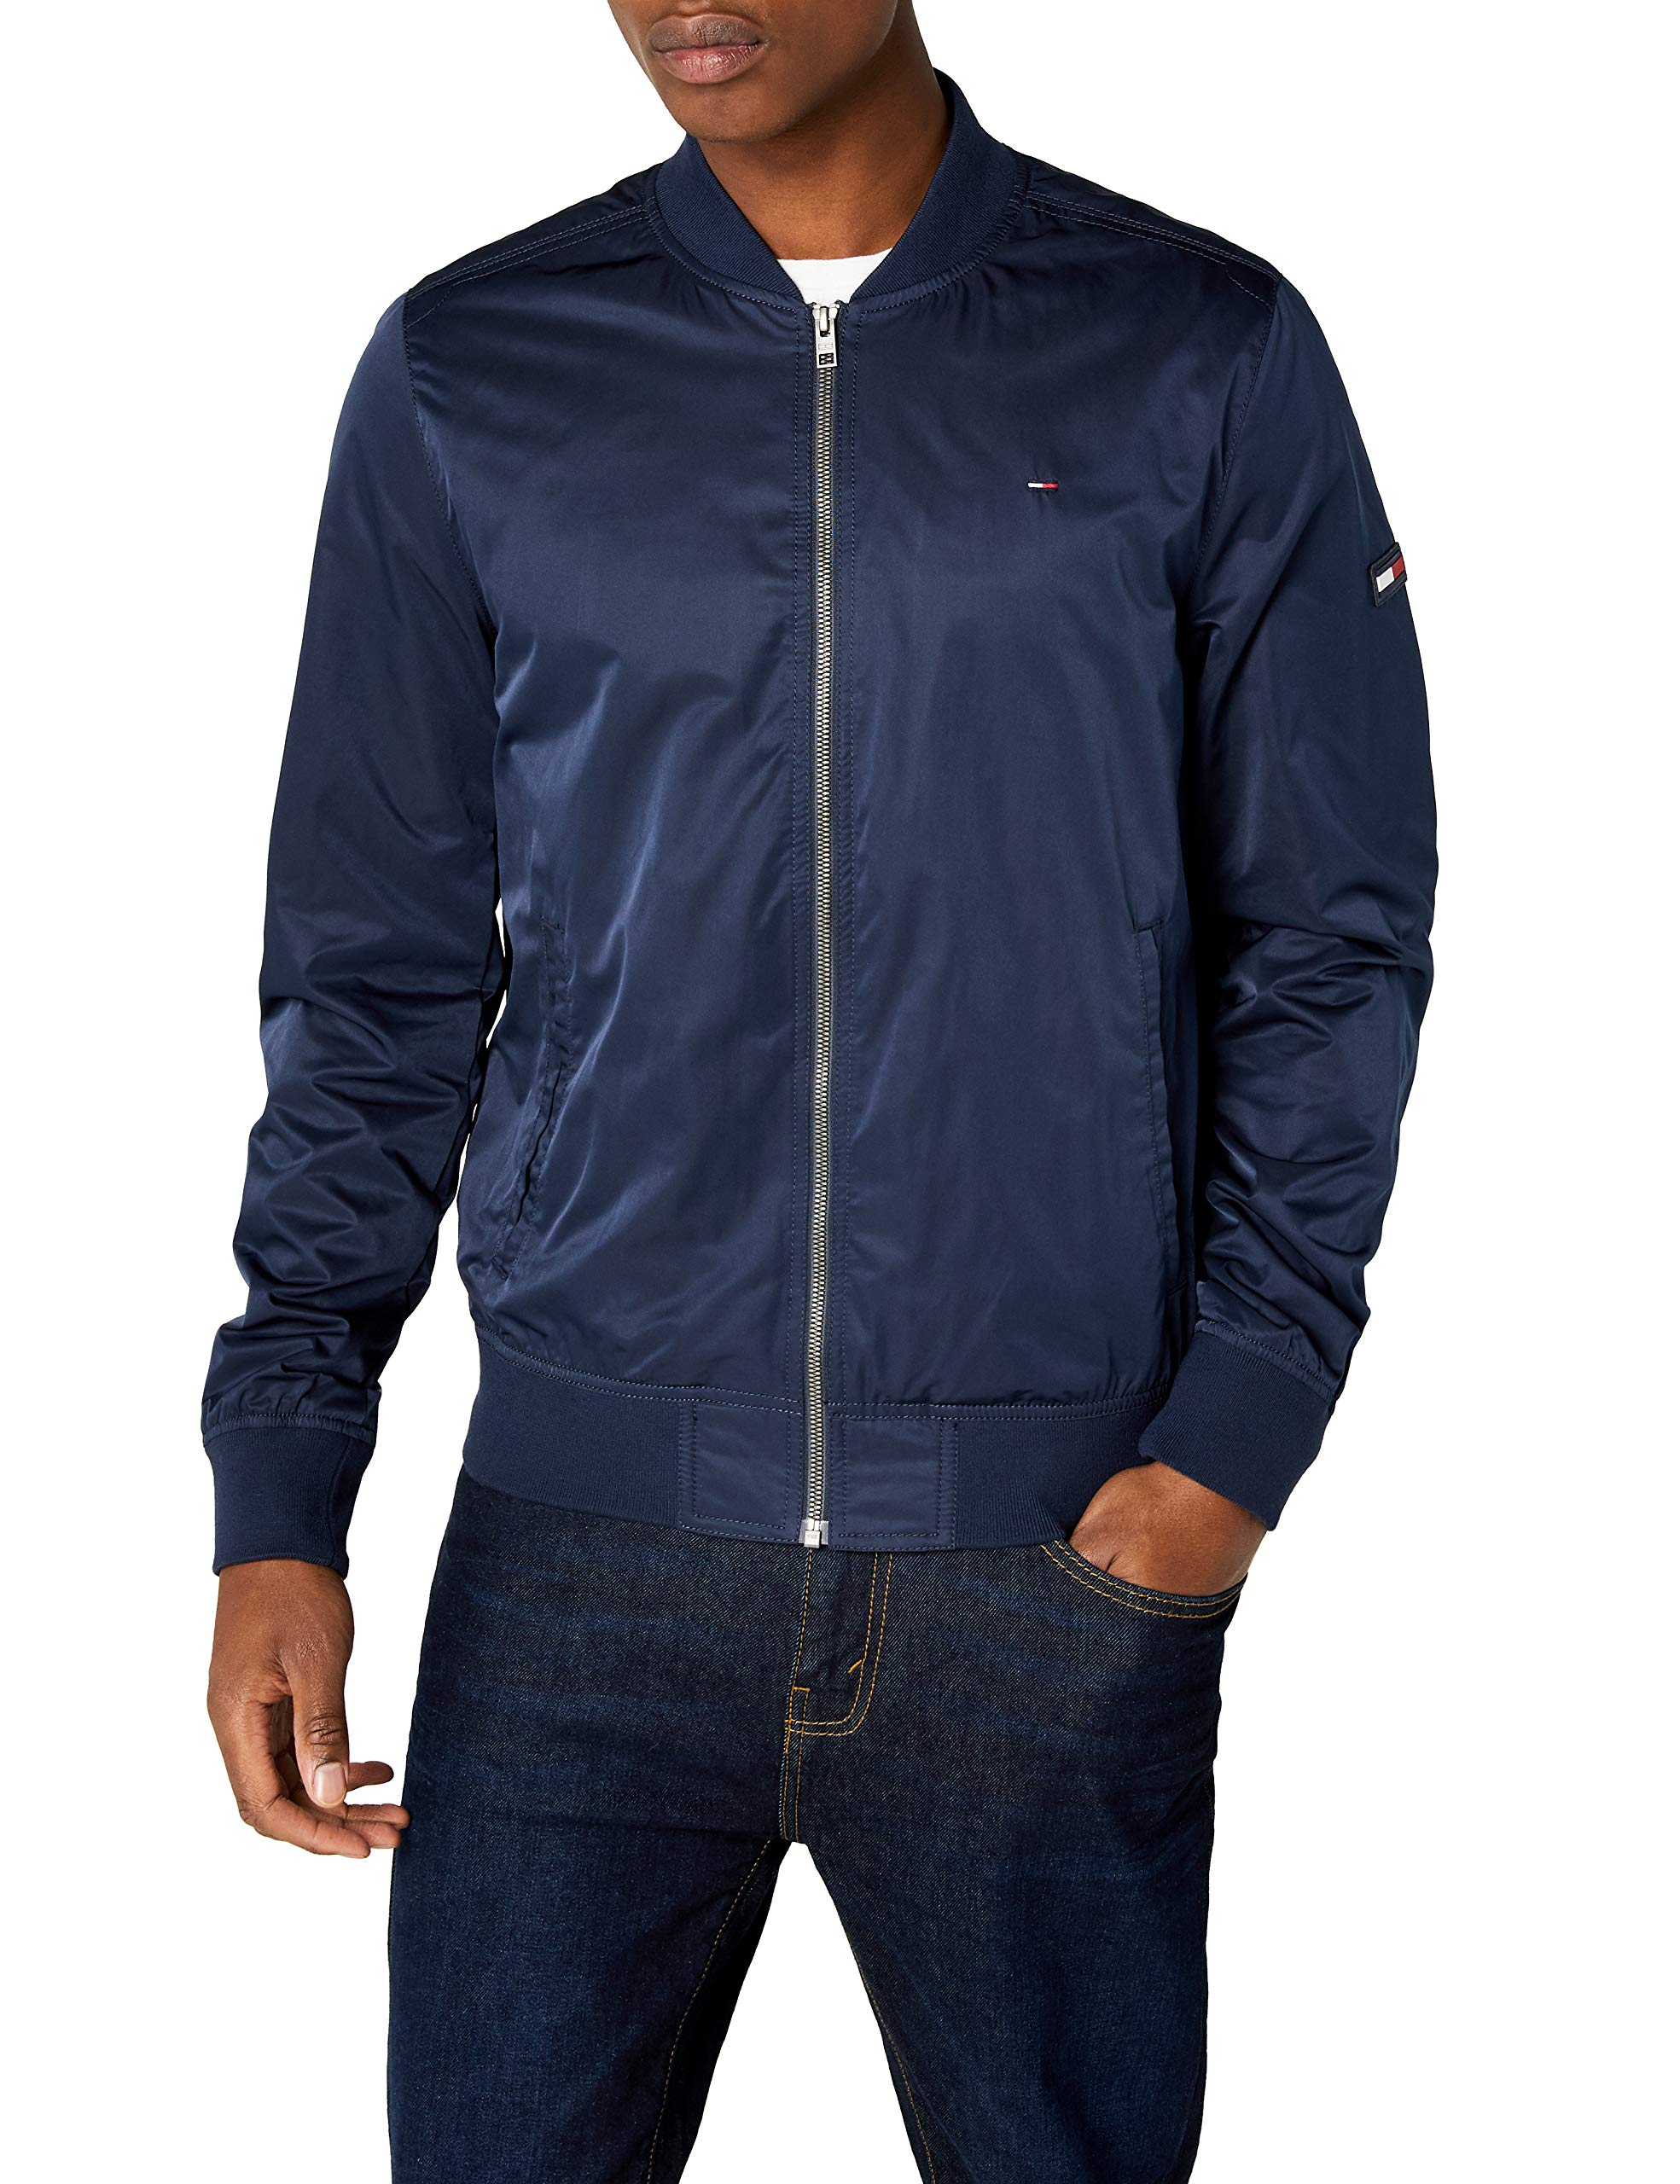 Jeans Homme Longues Bomber large Manches Droit Essential Bleublack Iris Tommy Straight 002X Blouson TF1Juc3lK